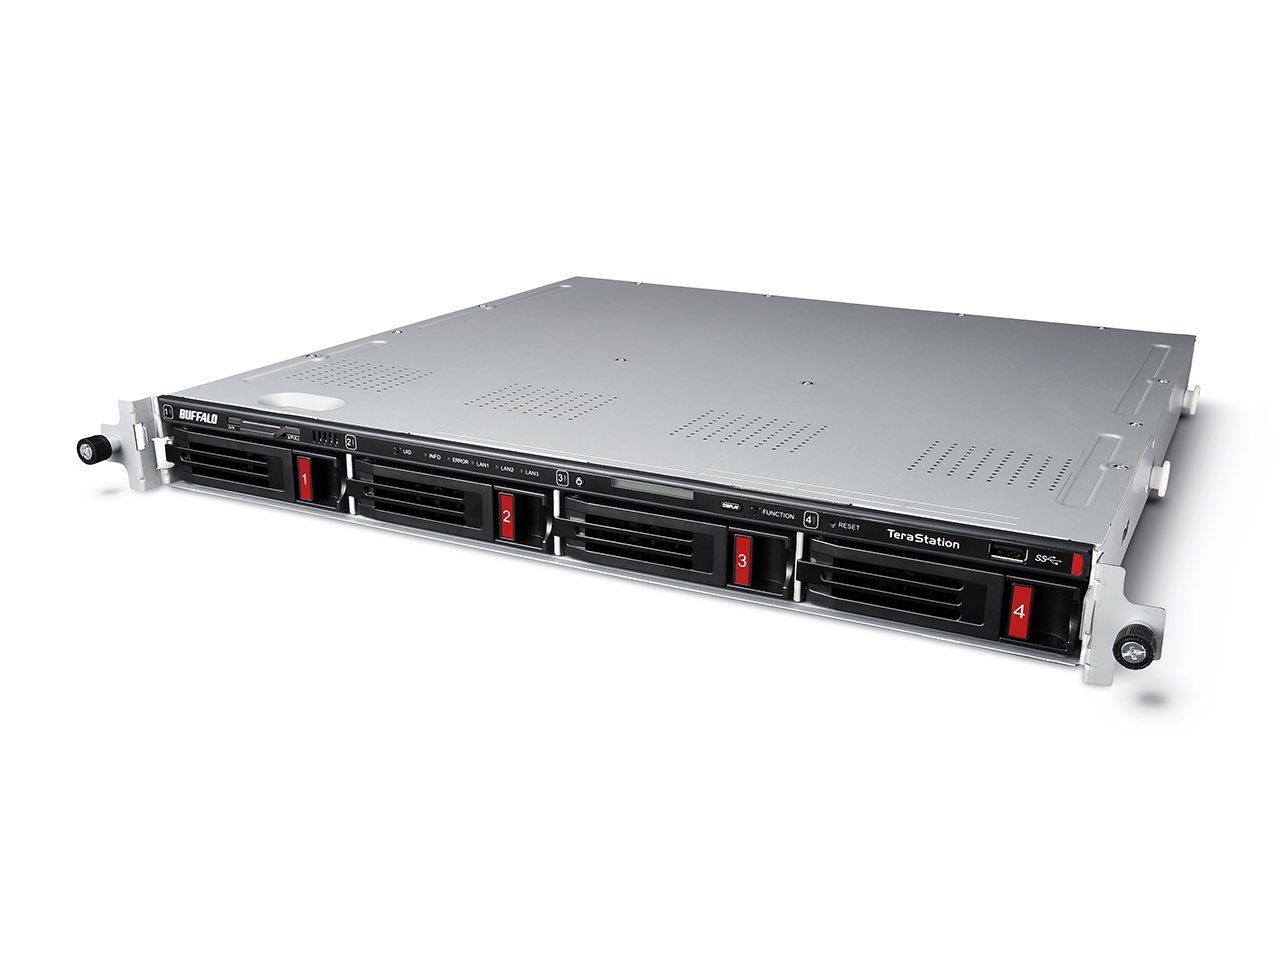 Buffalo TeraStation 5410RN Rackmount 24 TB NAS Hard Drives Included